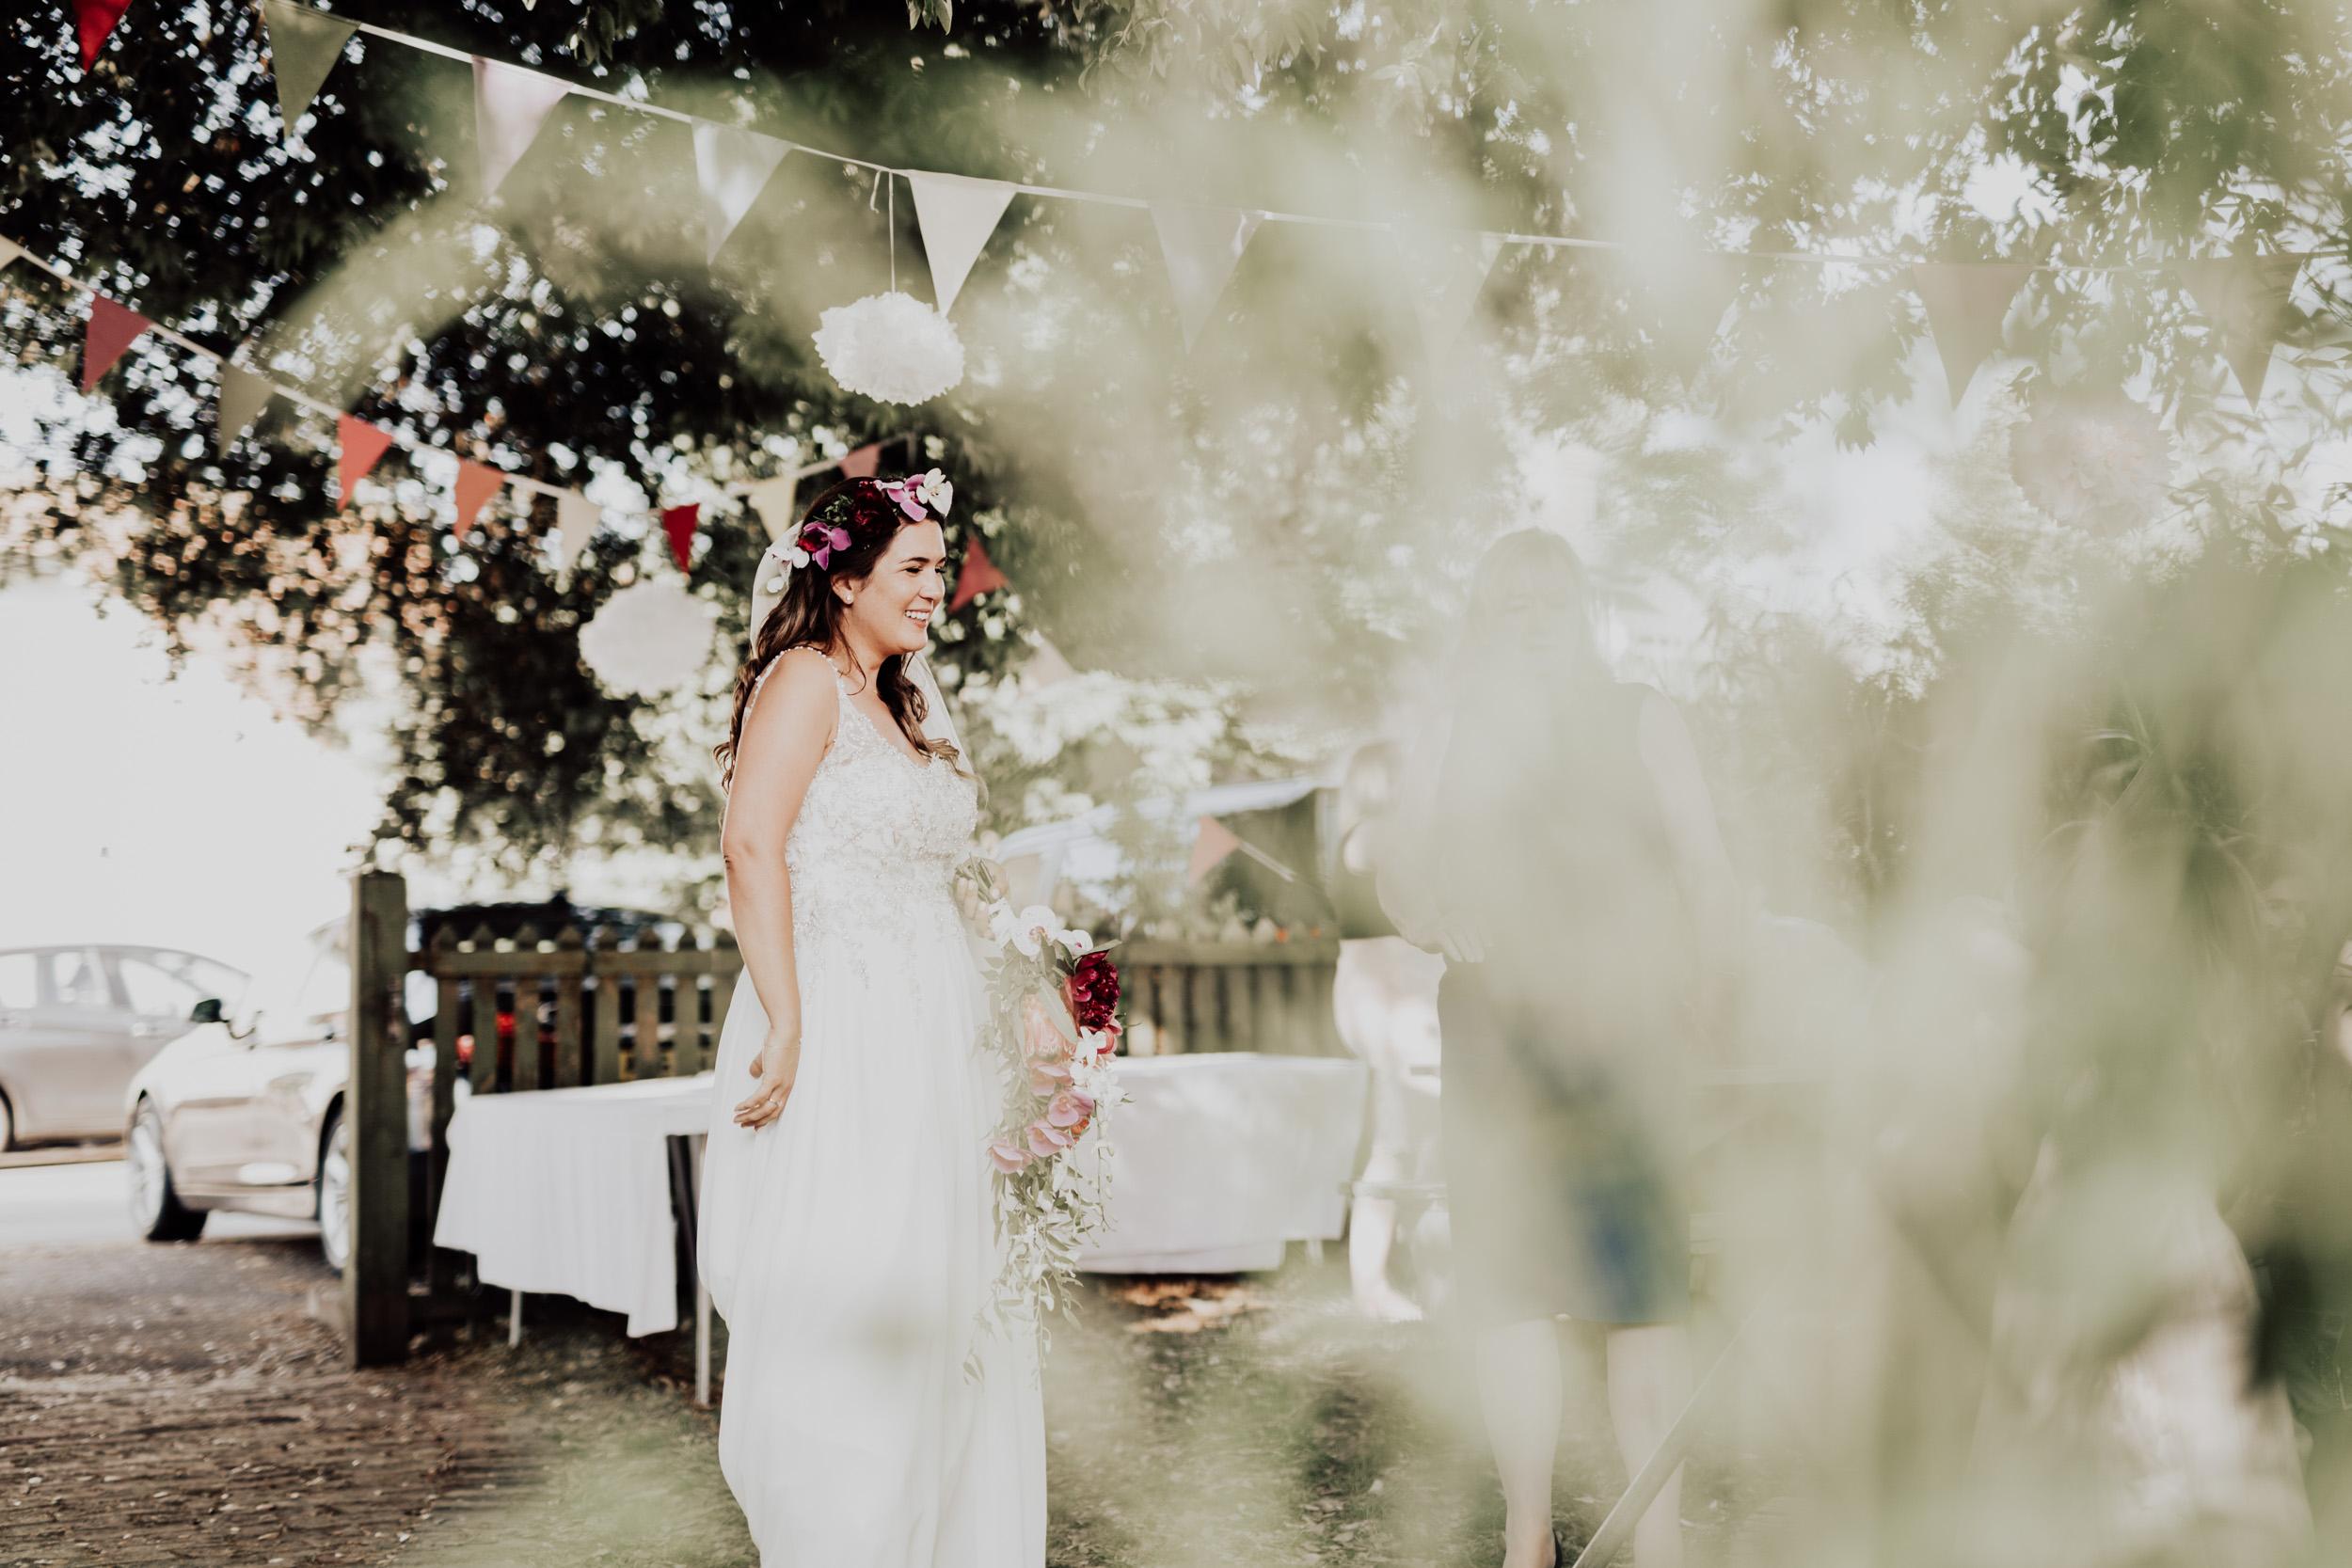 kent wedding photographer (52 of 57).jpg